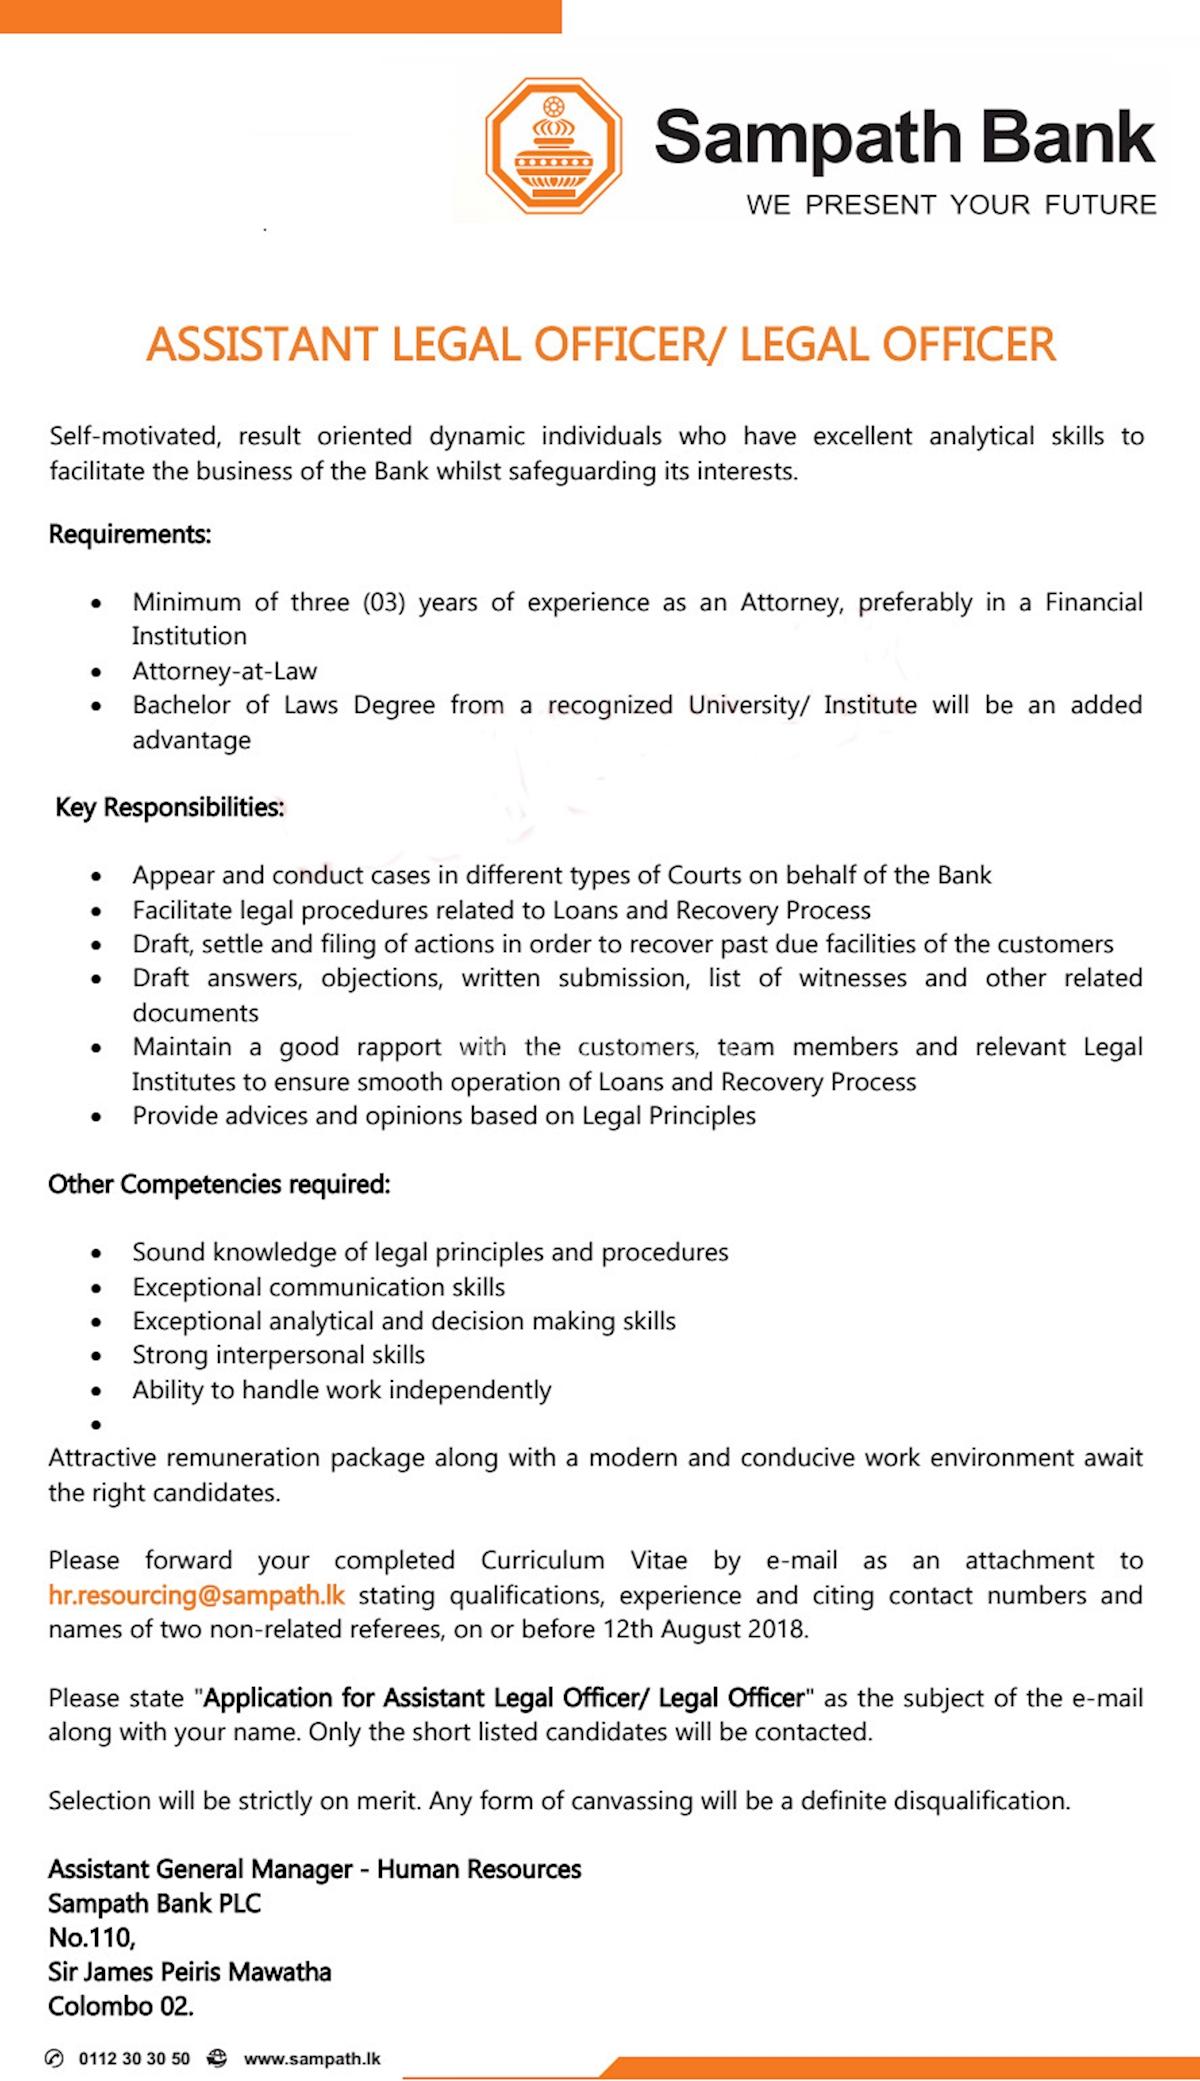 Assistant Legal Officer / Legal Officer